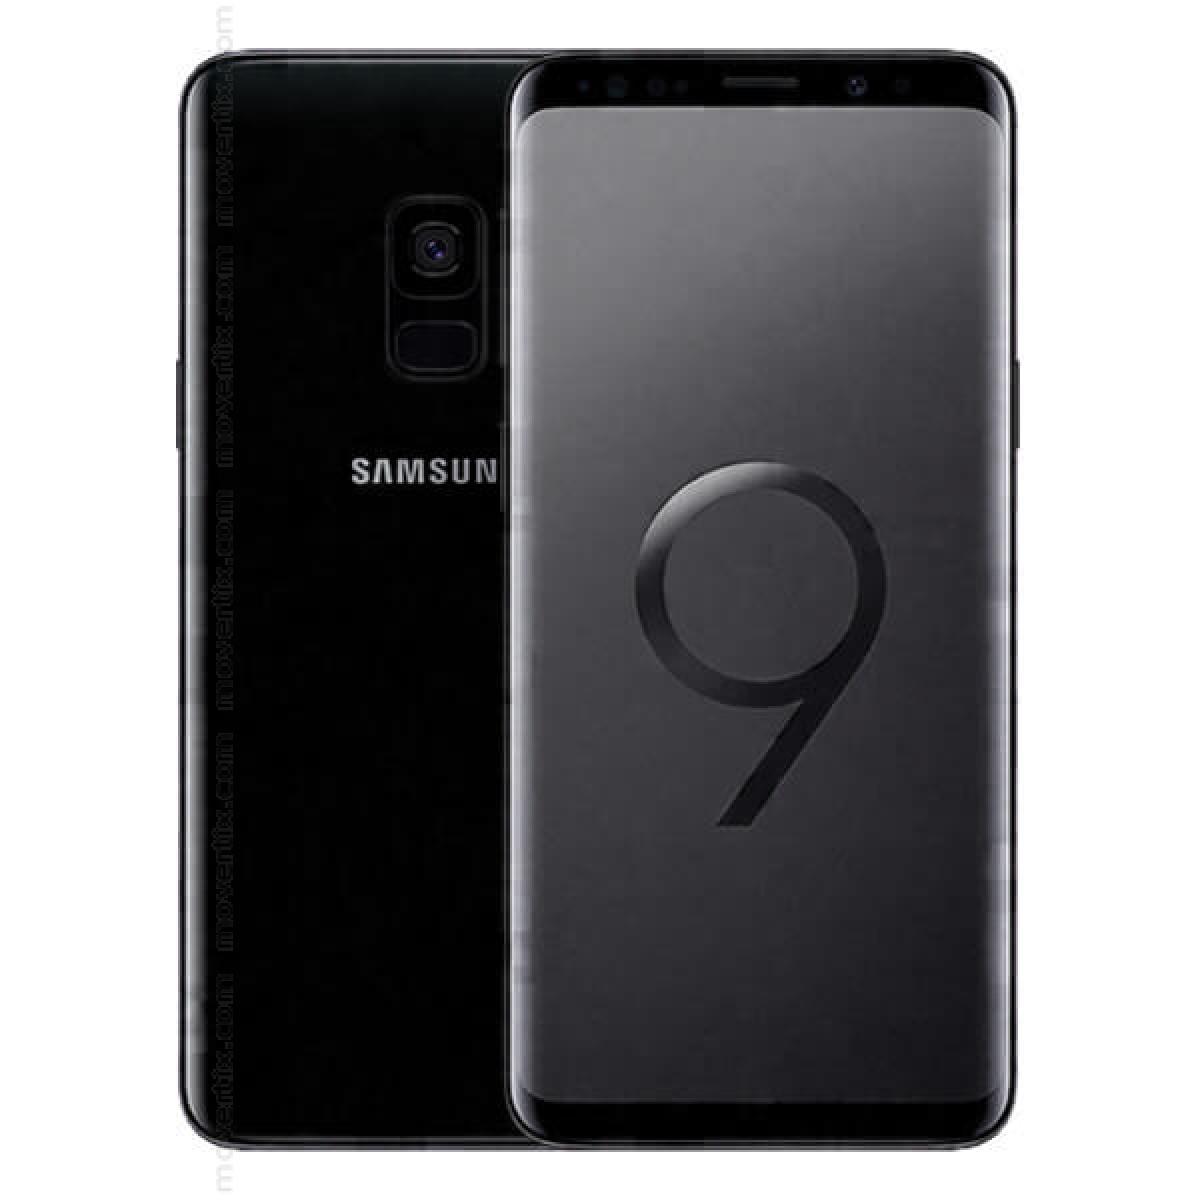 Samsung Galaxy S9 Dual Sim Midnight Black 64gb Sm G960f Ds 8801643148195 Movertix Mobile Phones Shop